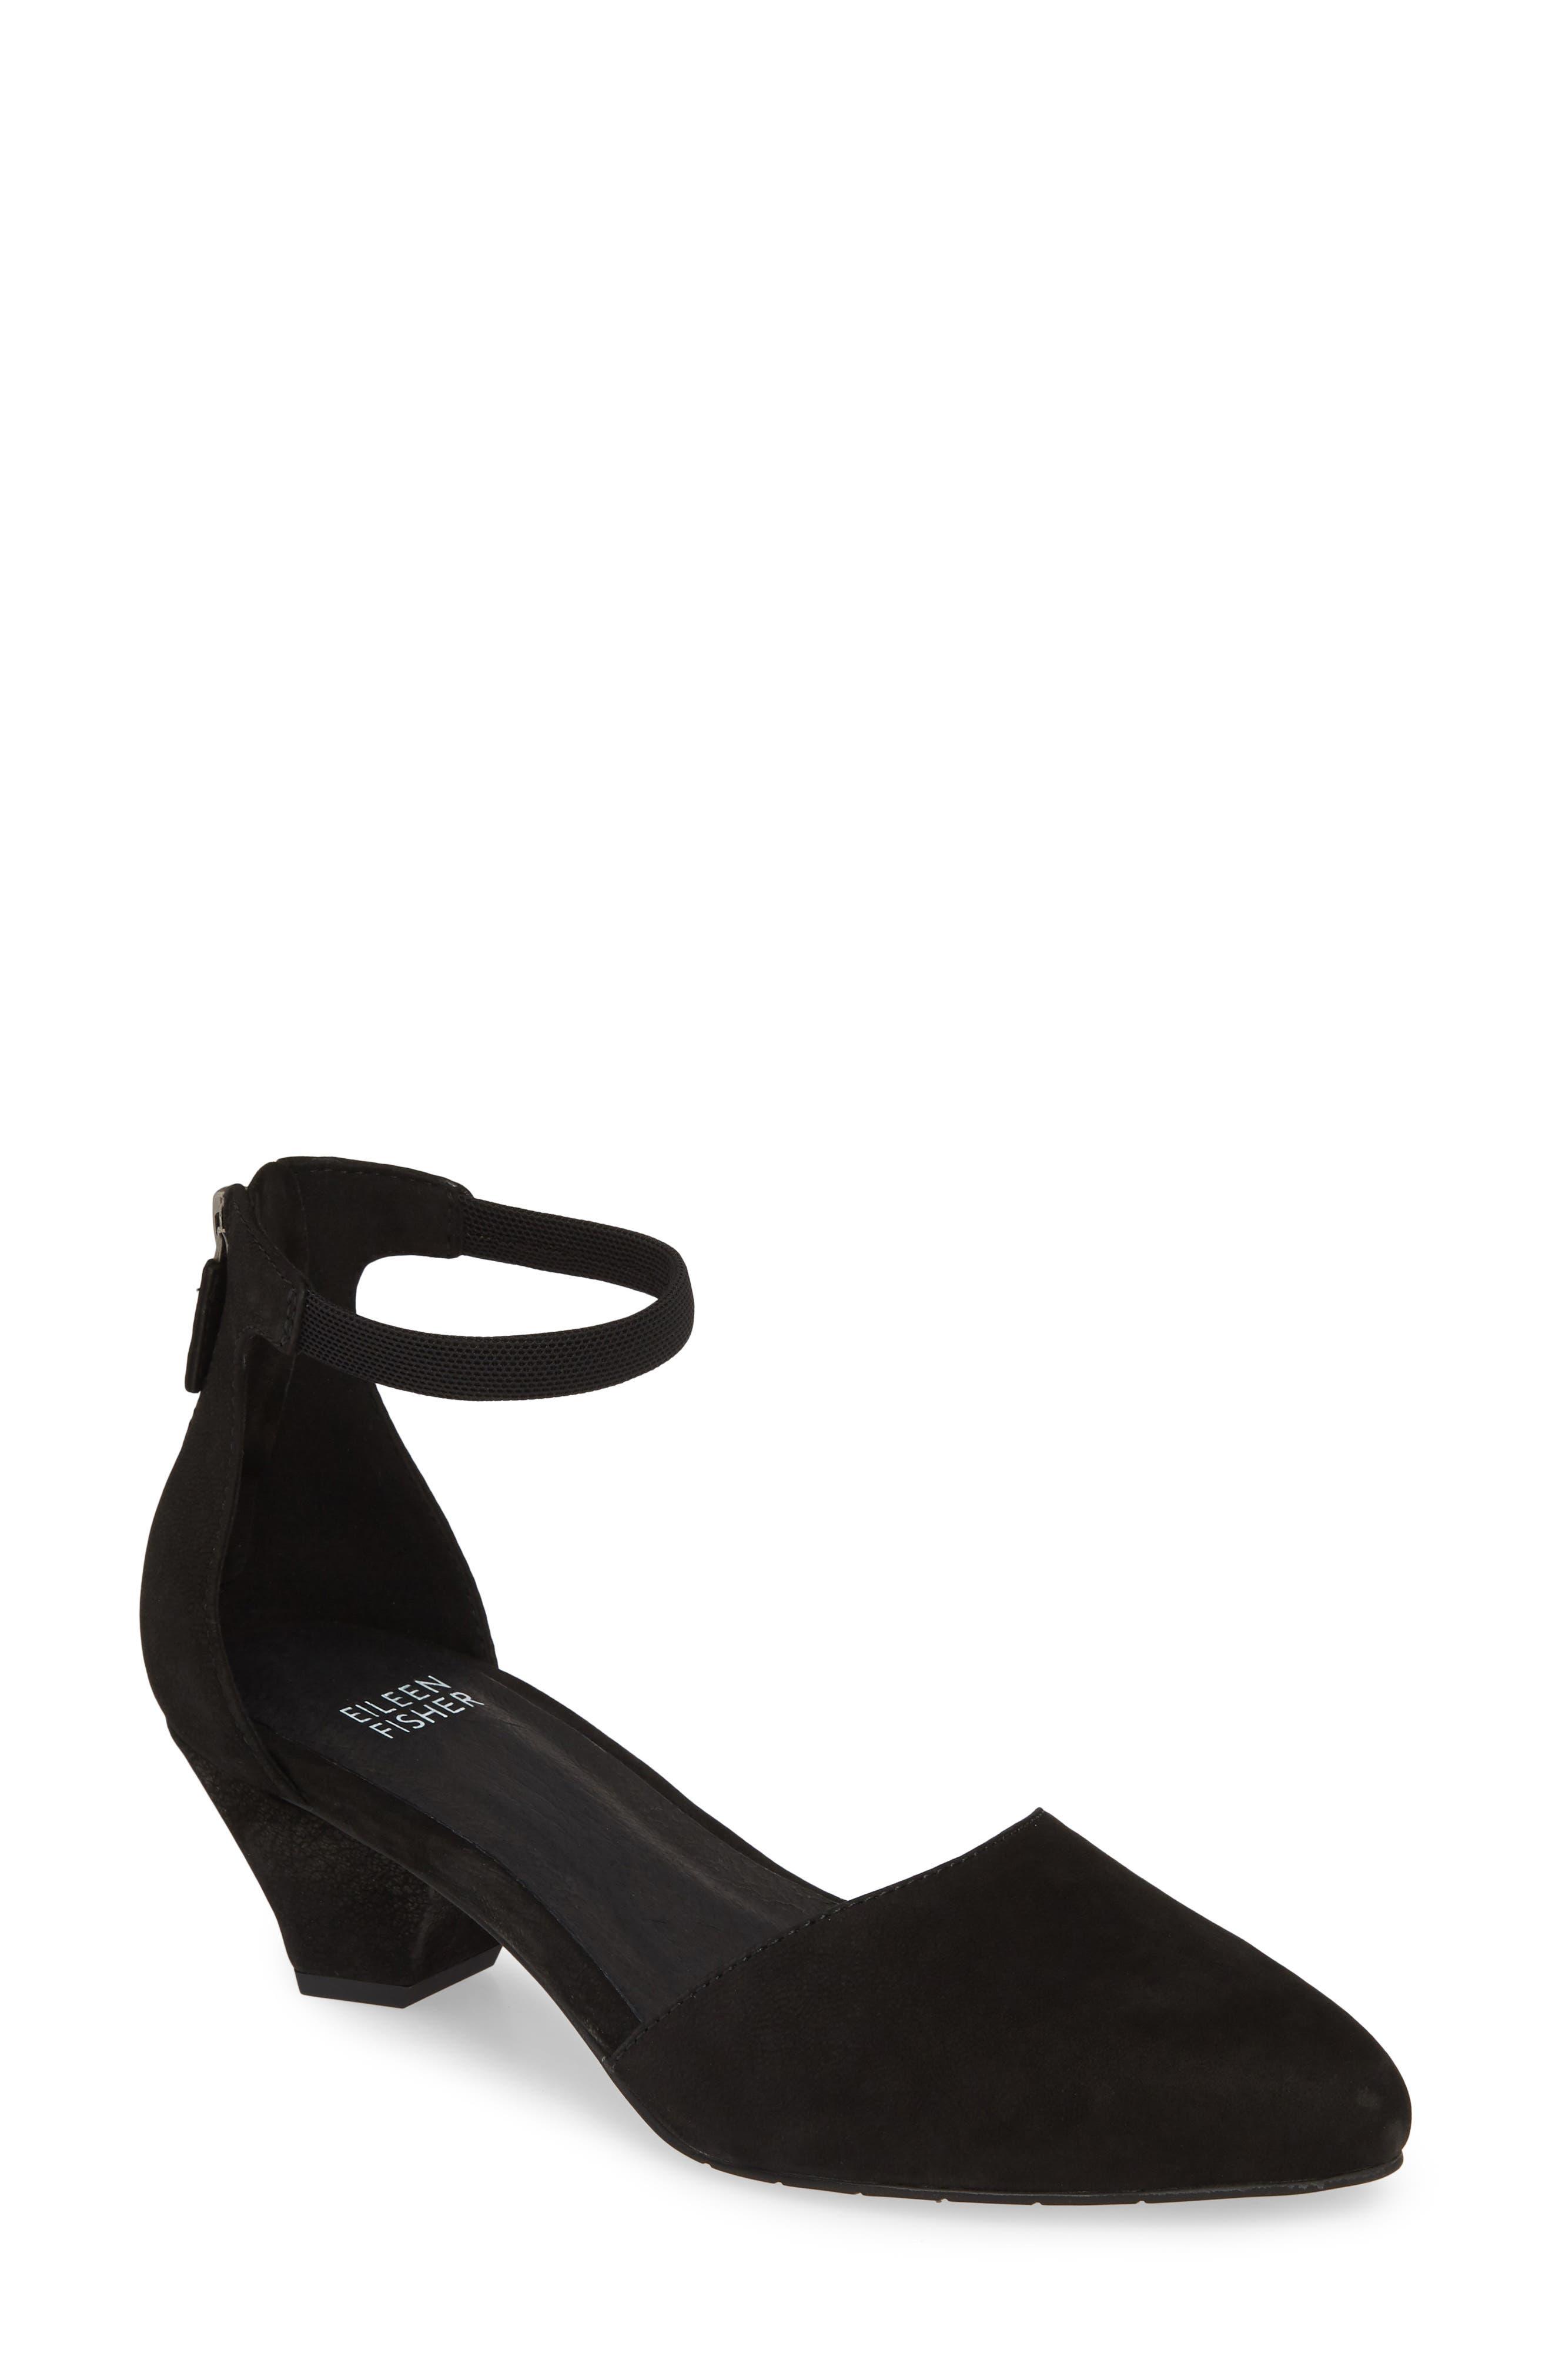 Eileen Fisher Just Ankle Strap Pump- Black